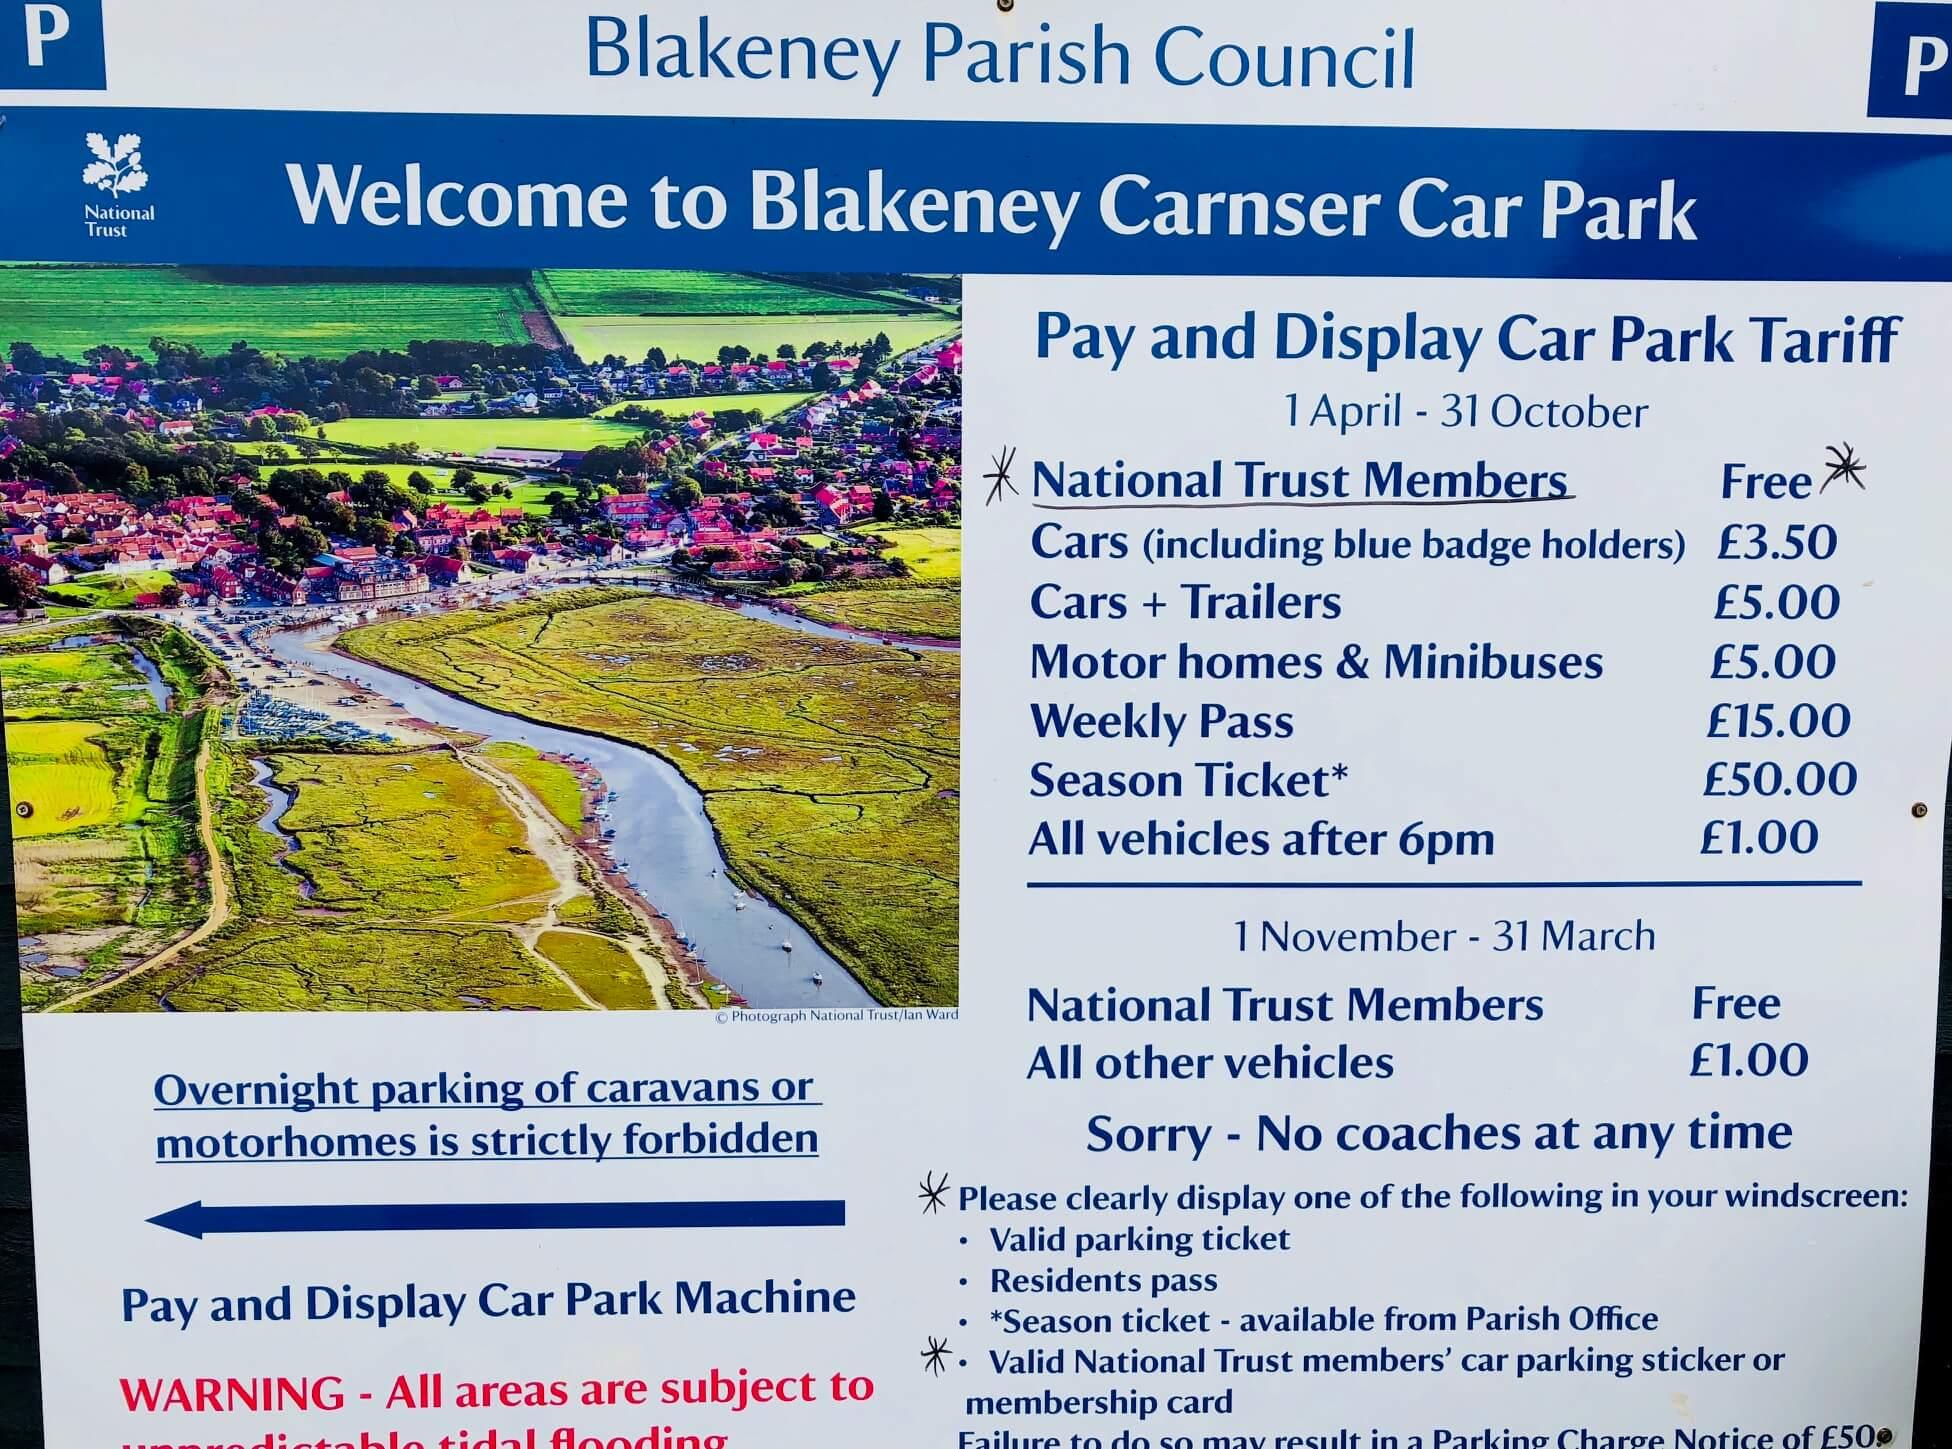 Free National Trust coastal parking